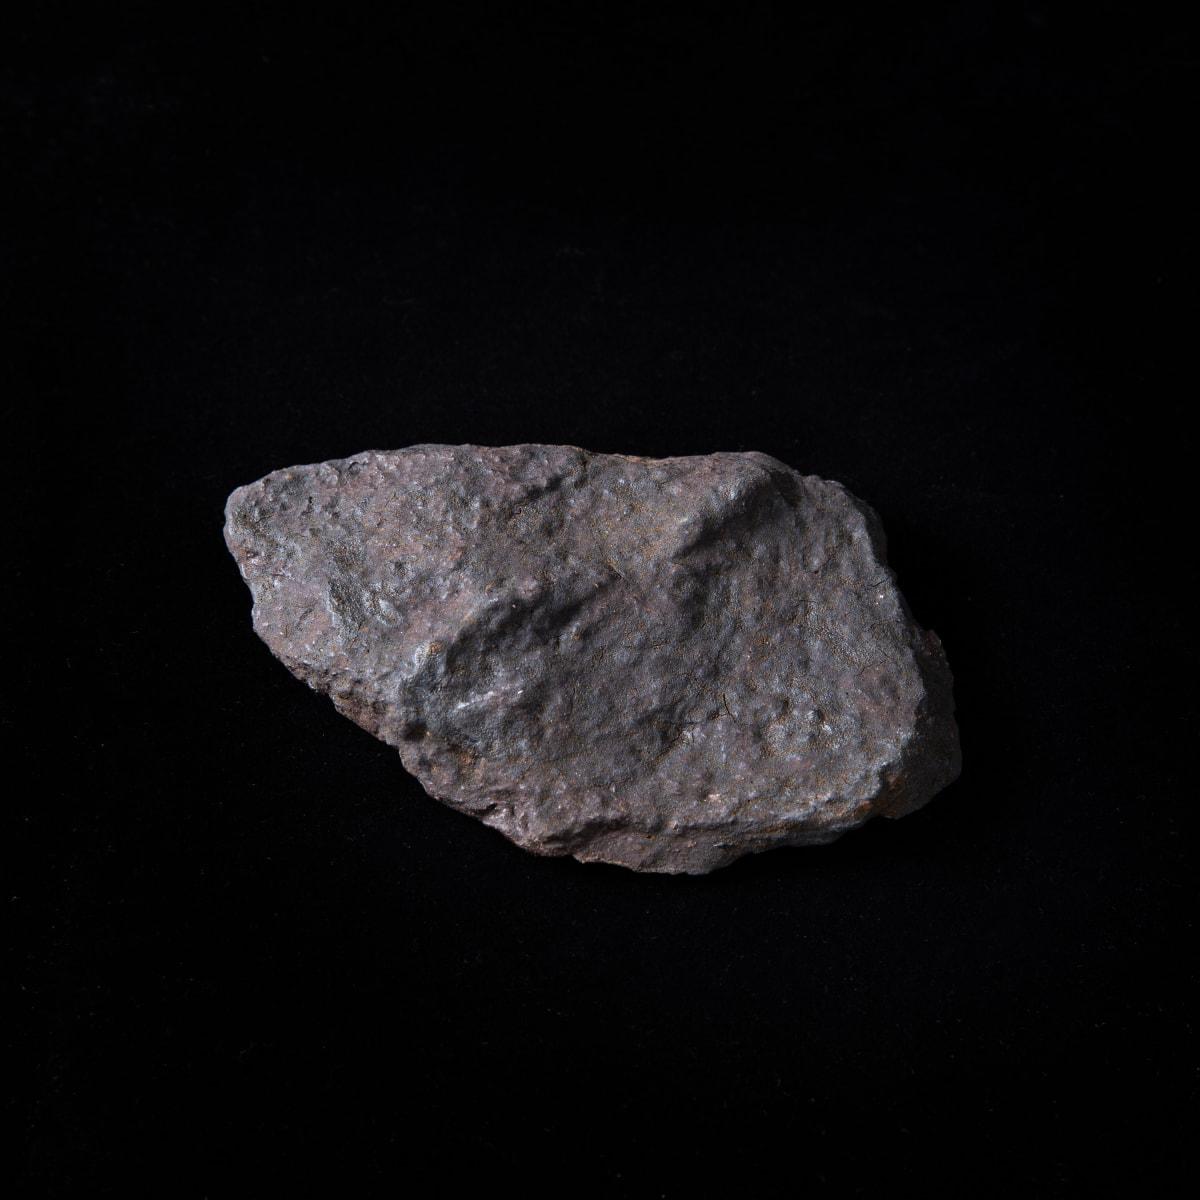 Meekyoung Shin Megalith MS12, 2019 Glazed stoneware 13 x 7.5 x 3 cm 5 1/8 x 3 x 1 1/8 in